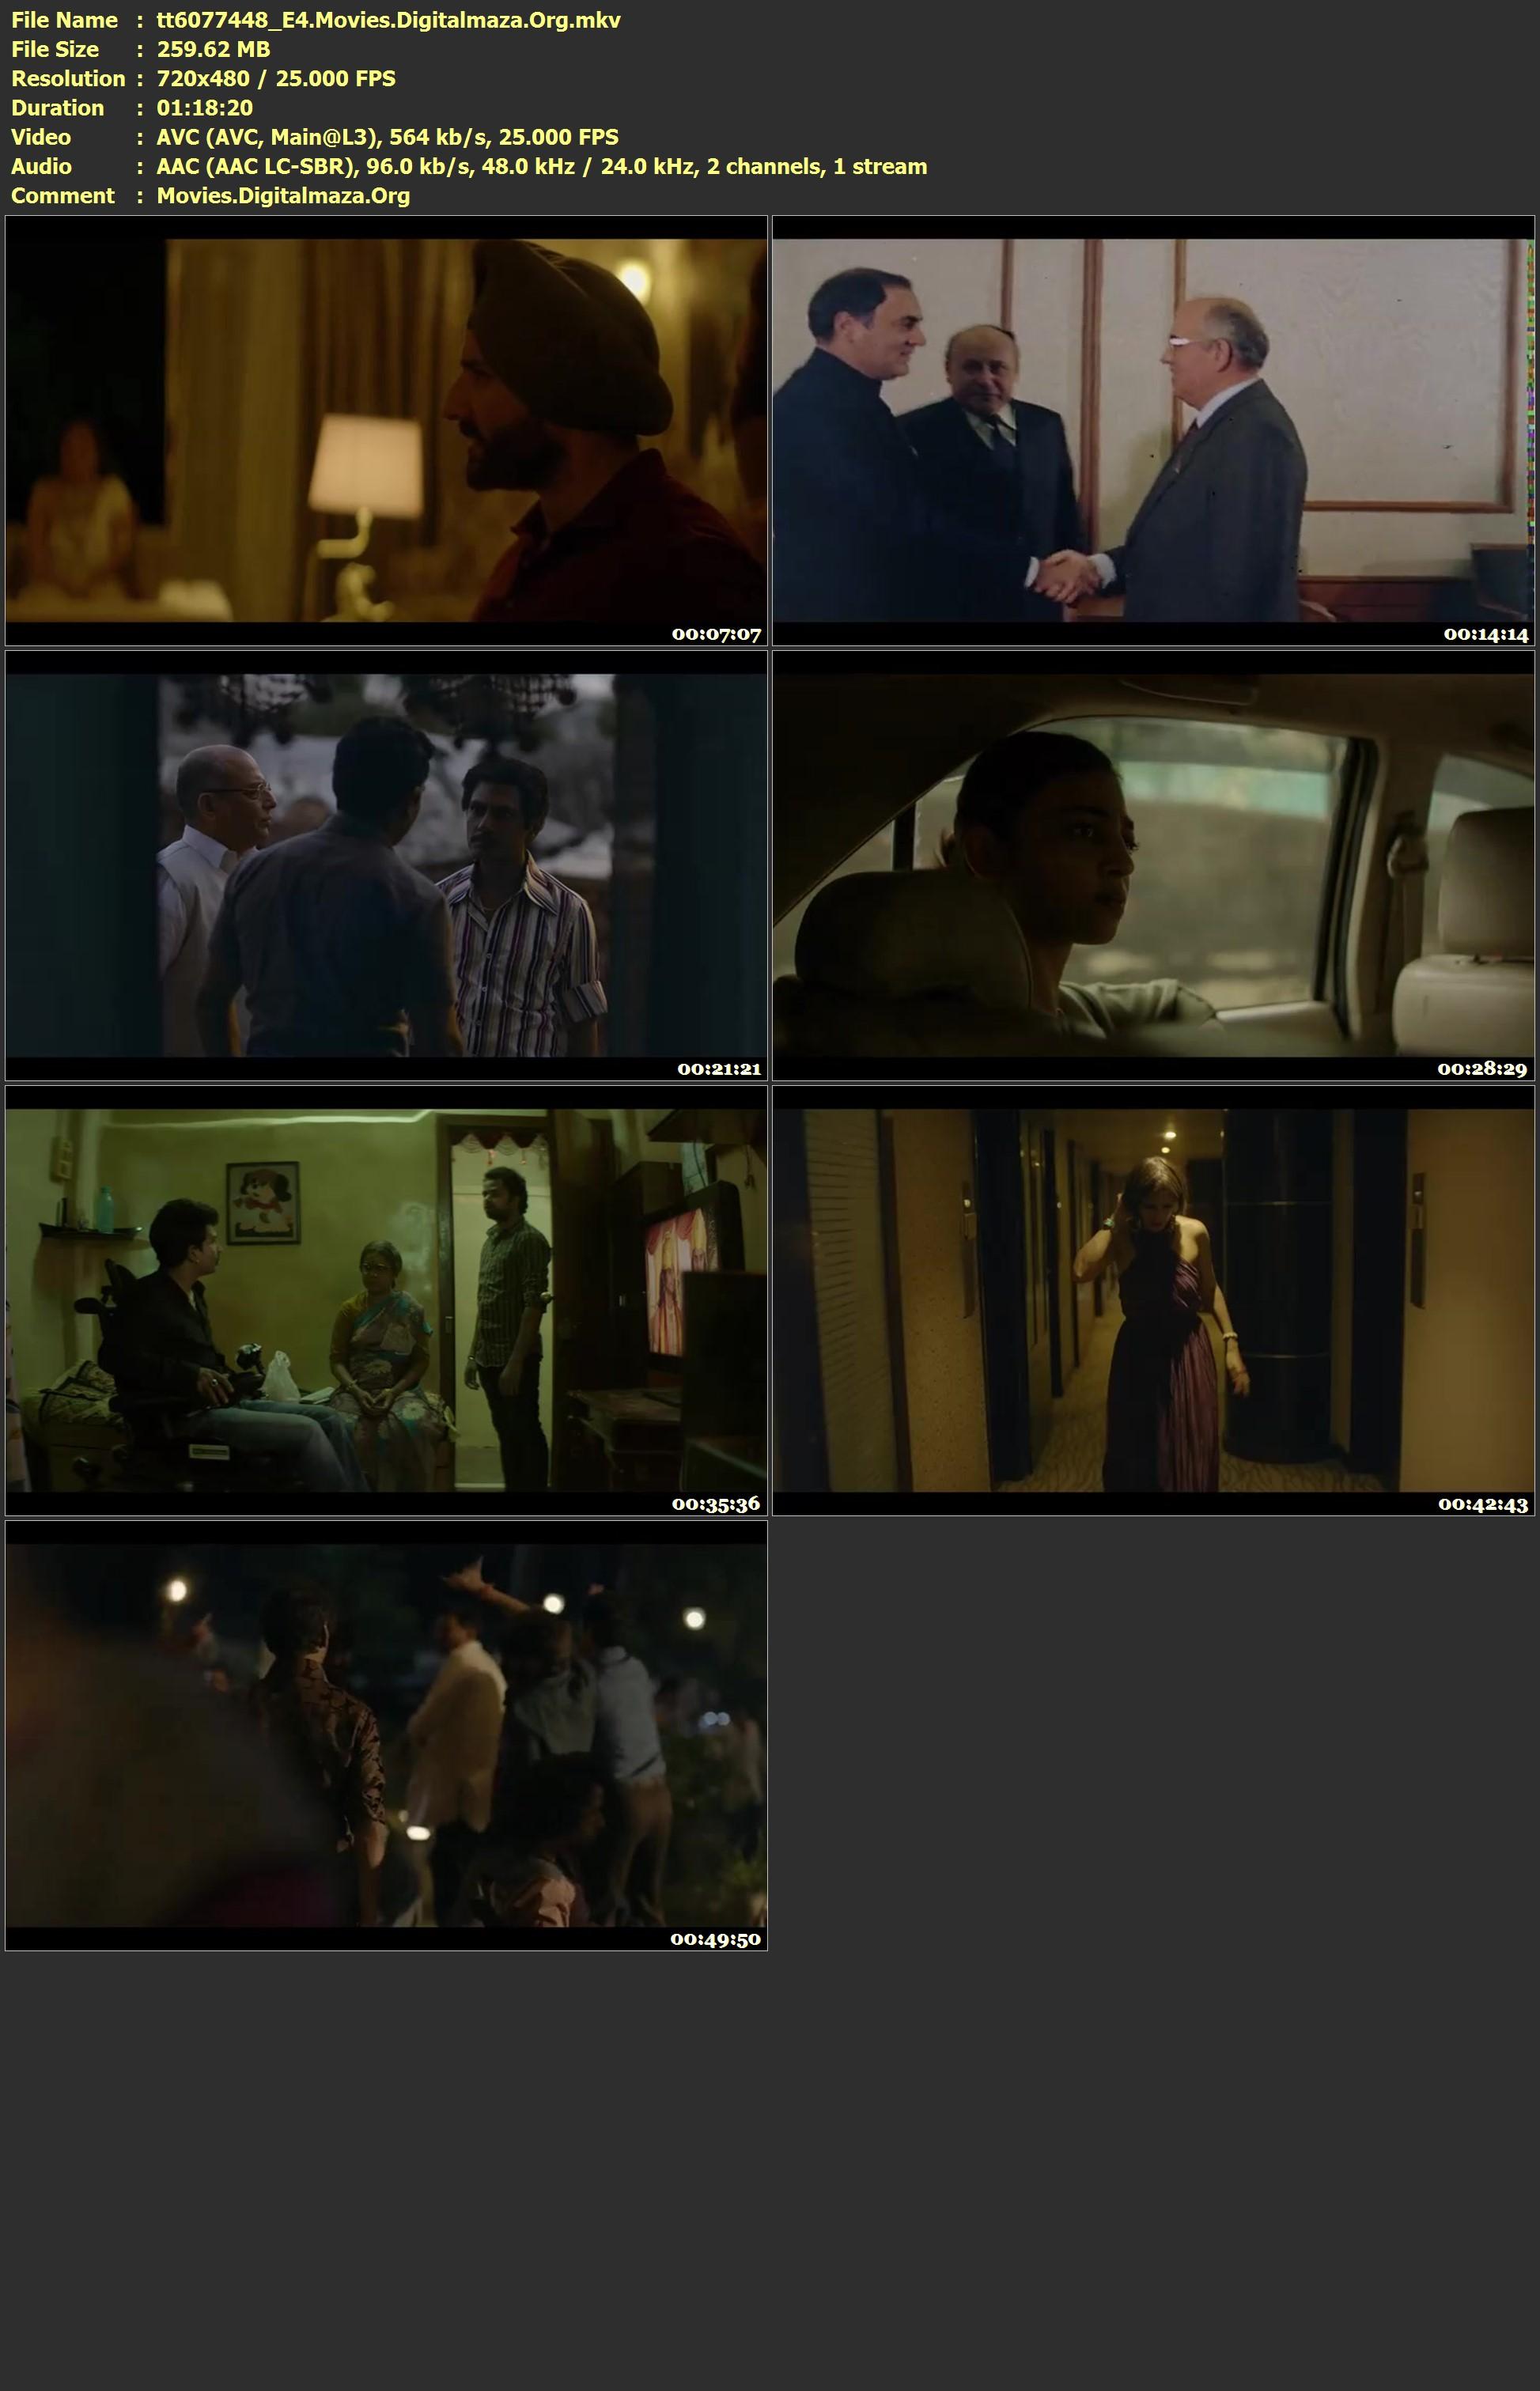 https://image.ibb.co/n6Tard/tt6077448_E4_Movies_Digitalmaza_Org_mkv.jpg